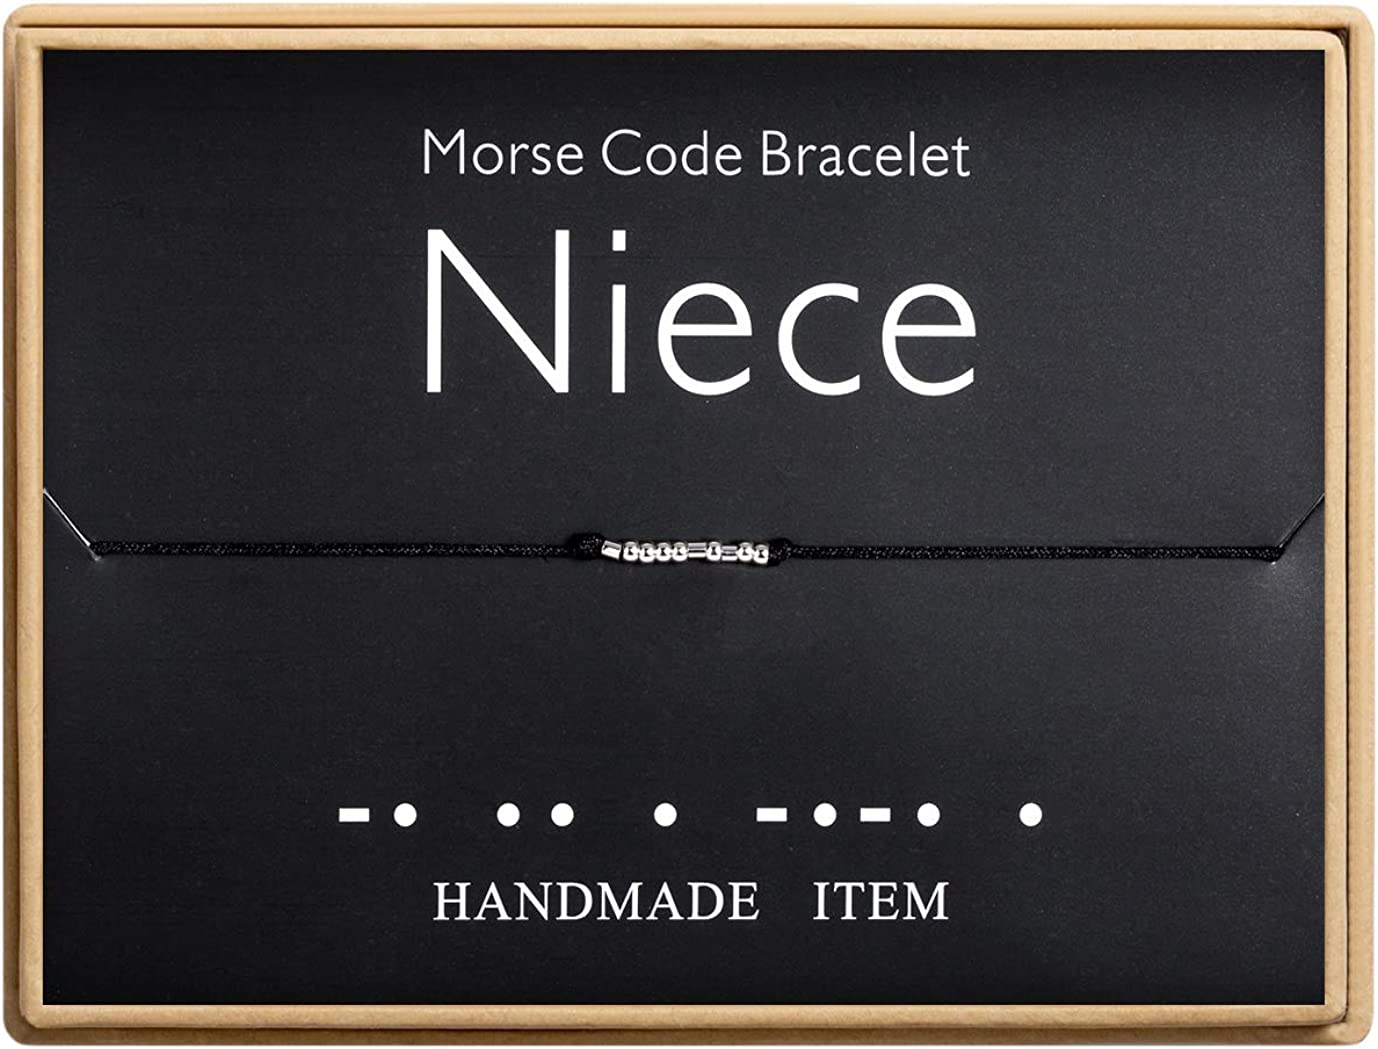 Niece Bracelet Morse Code Bracelet Handmade Bead Adjustable Stri